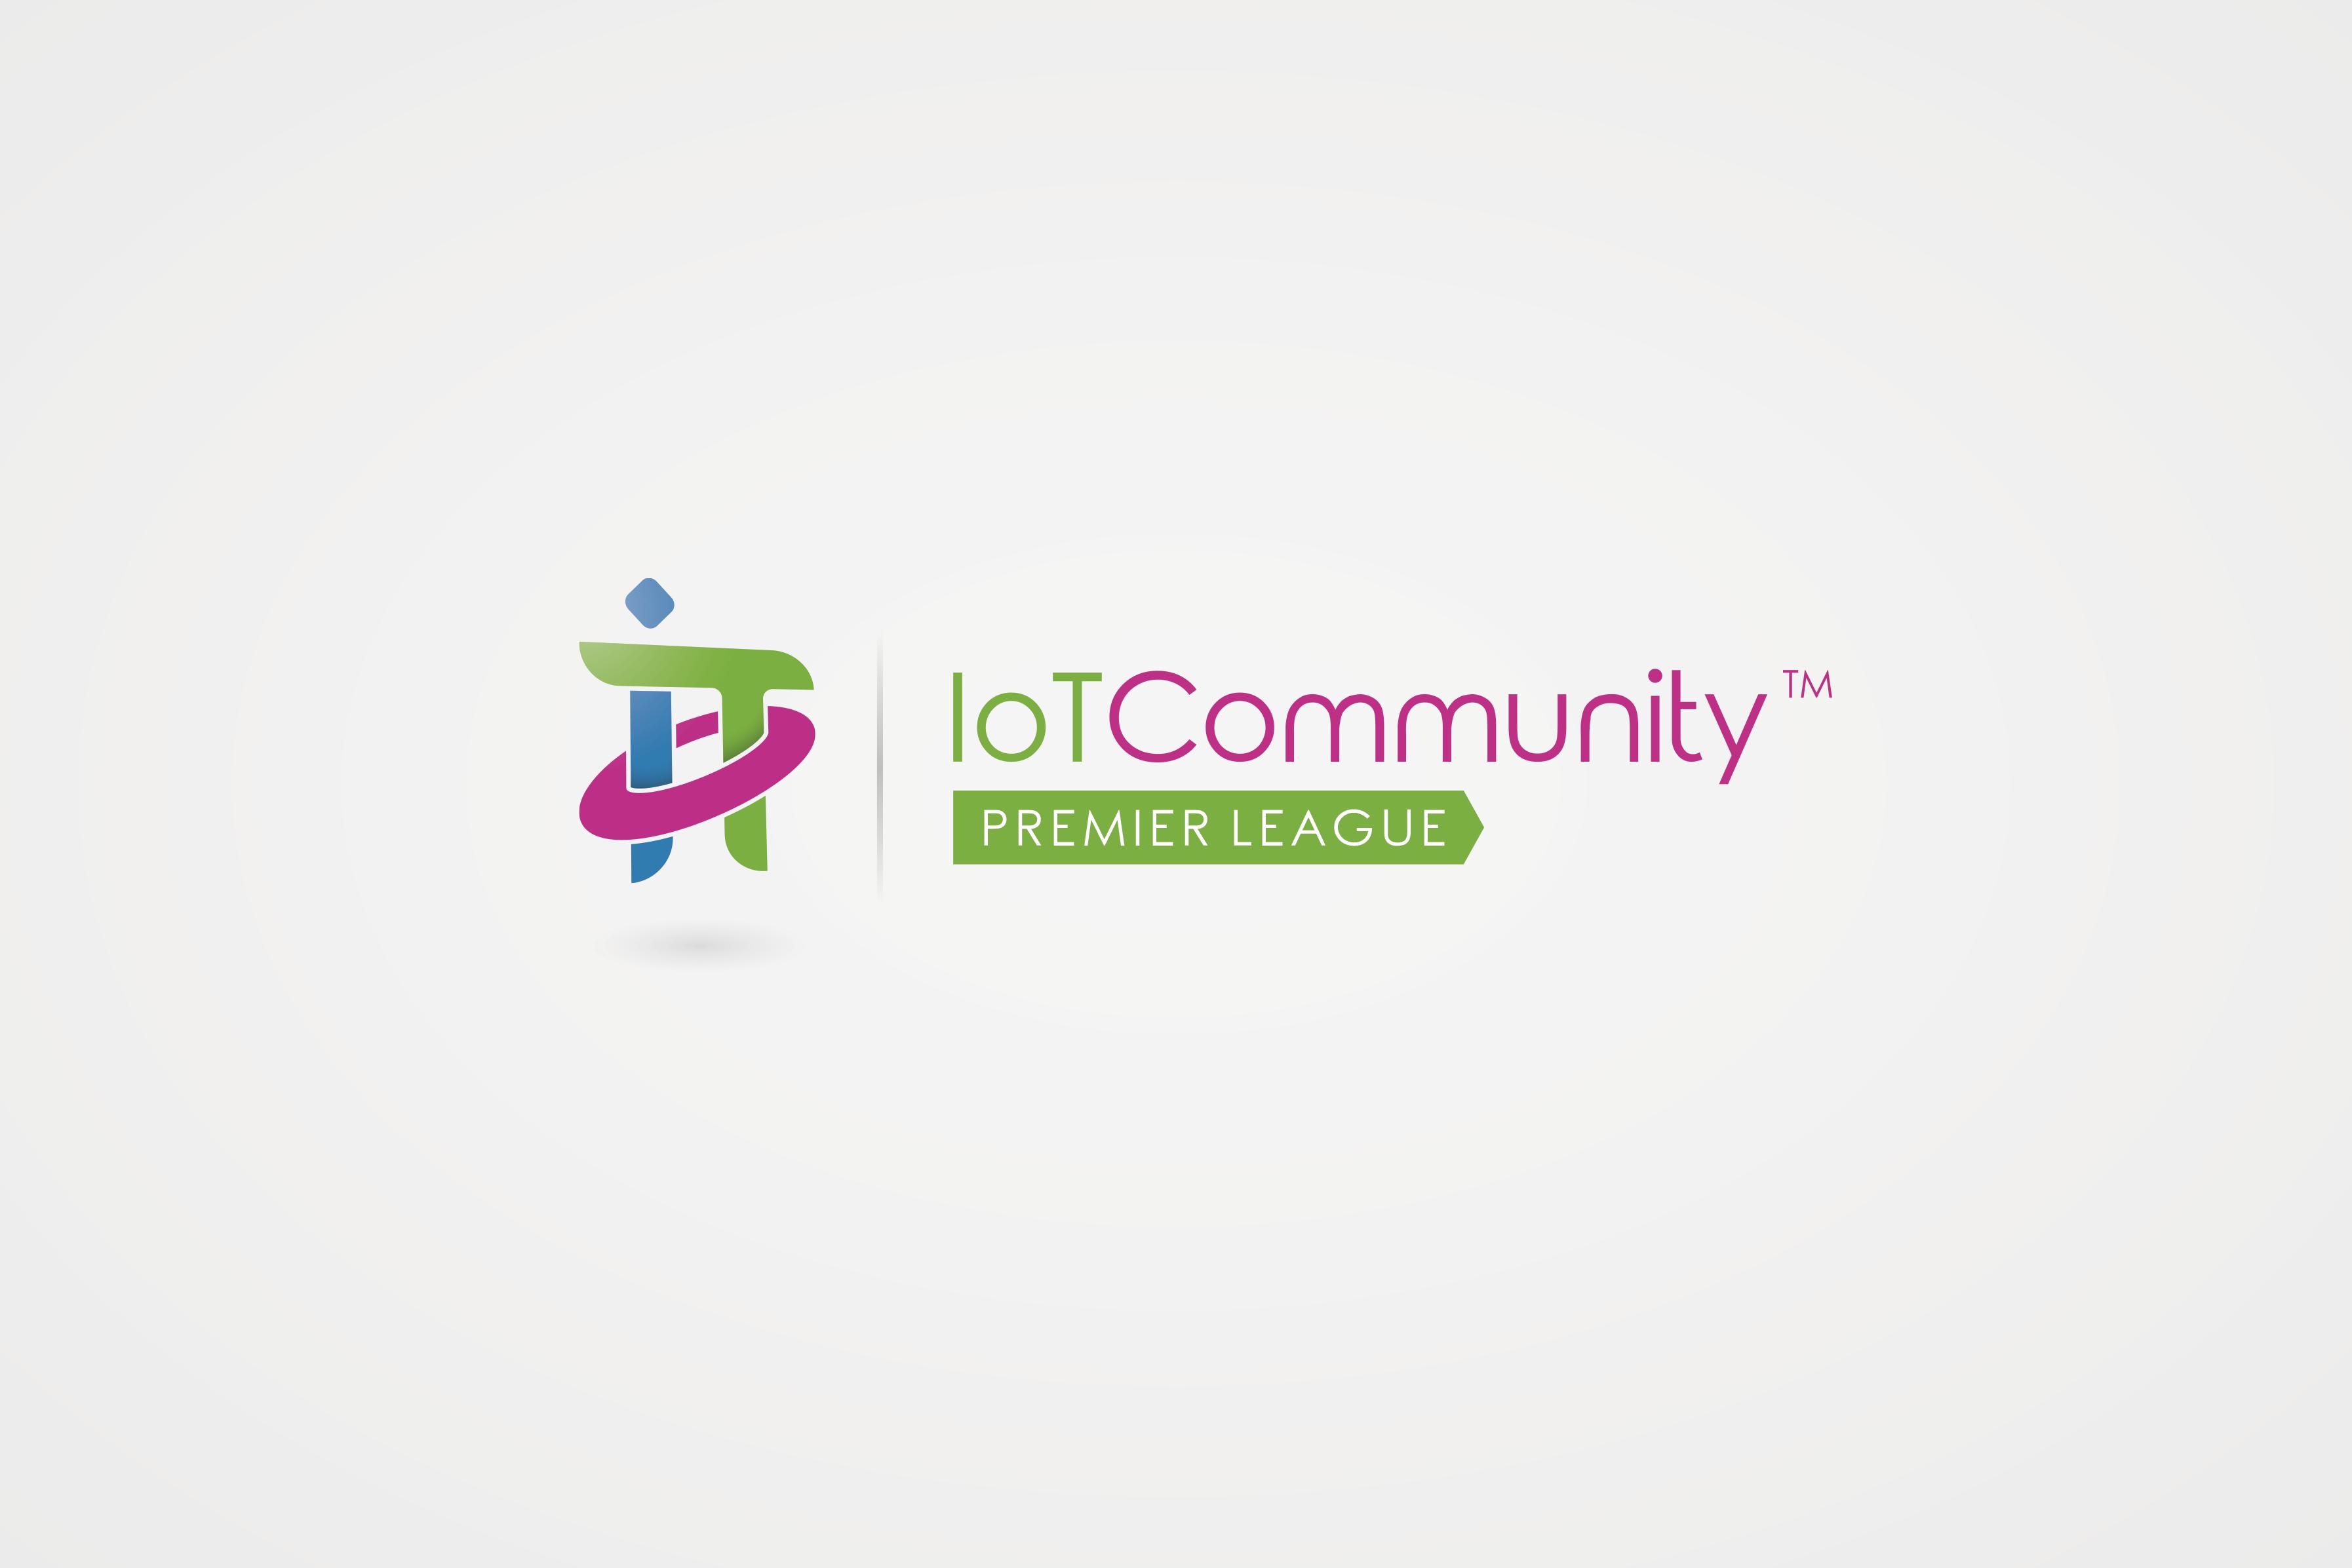 Iot Premier League ™ Media, Industry, Analyst